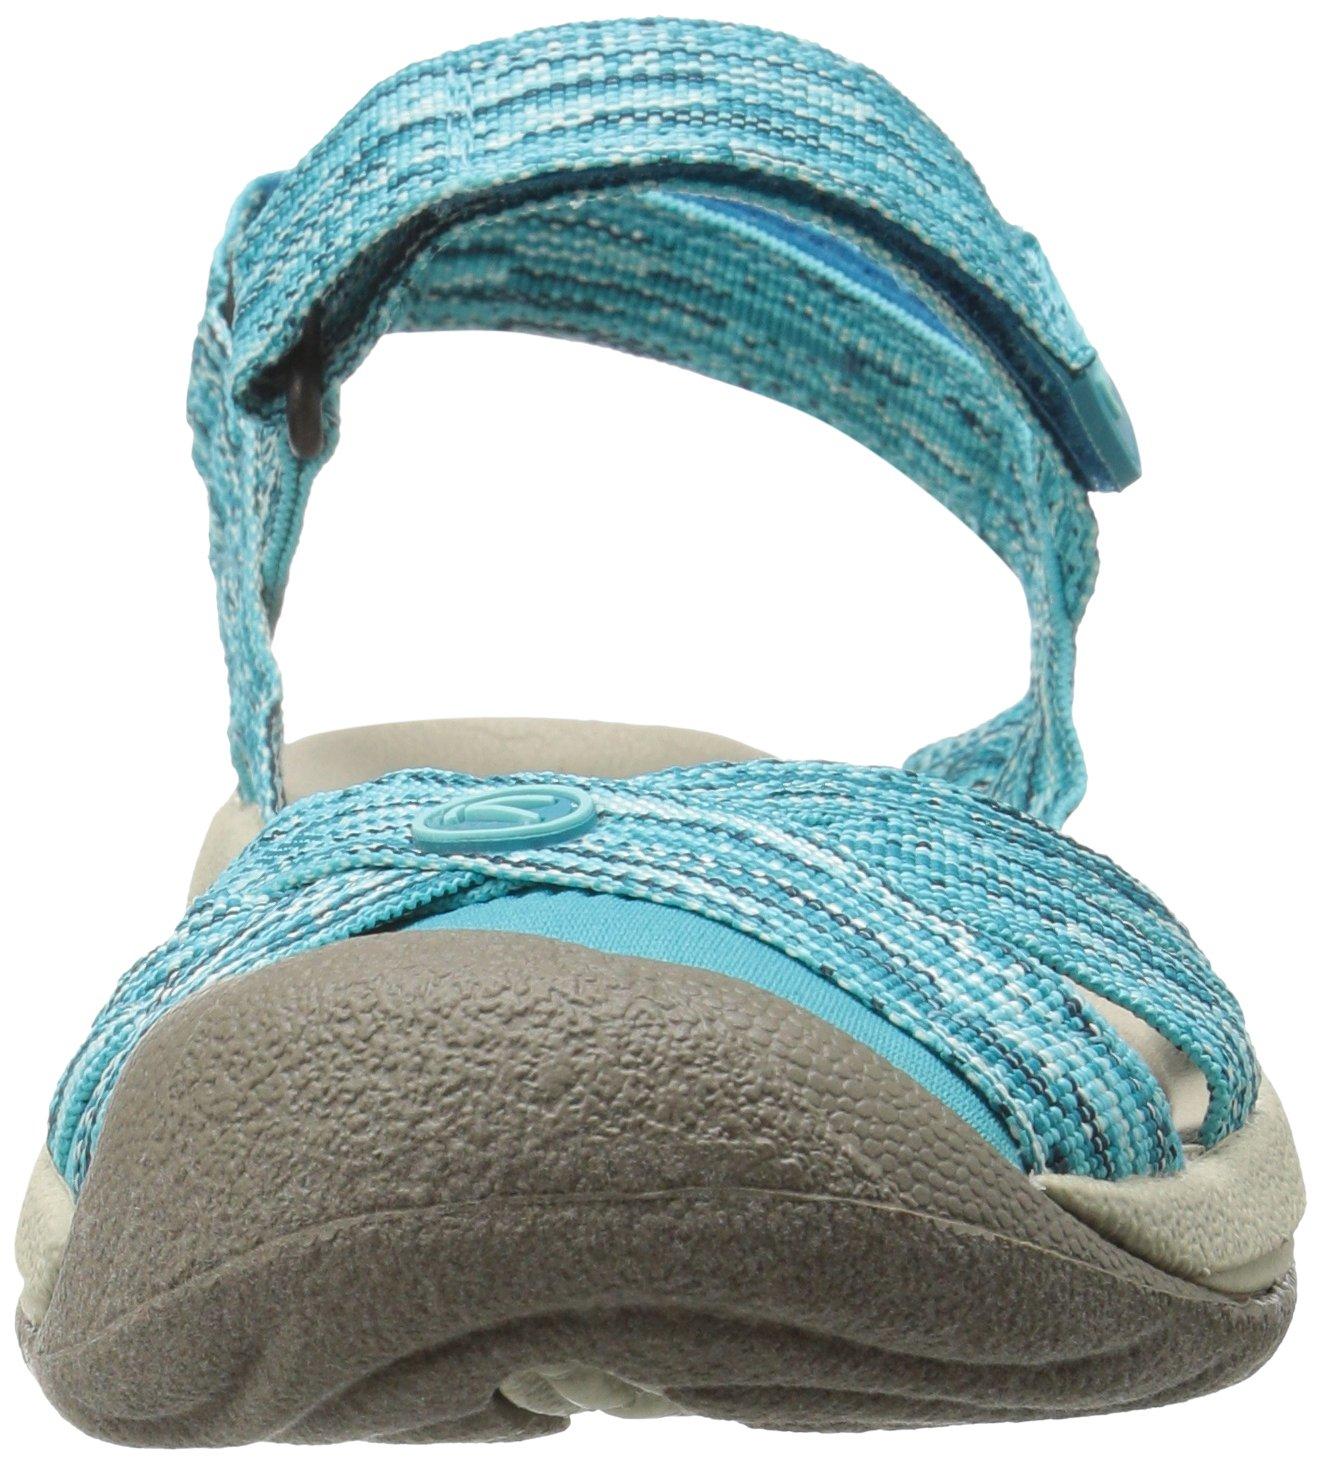 KEEN Women's Bali Strap Sandal B01H76V80K 9 B(M) US|Radiance/Algiers